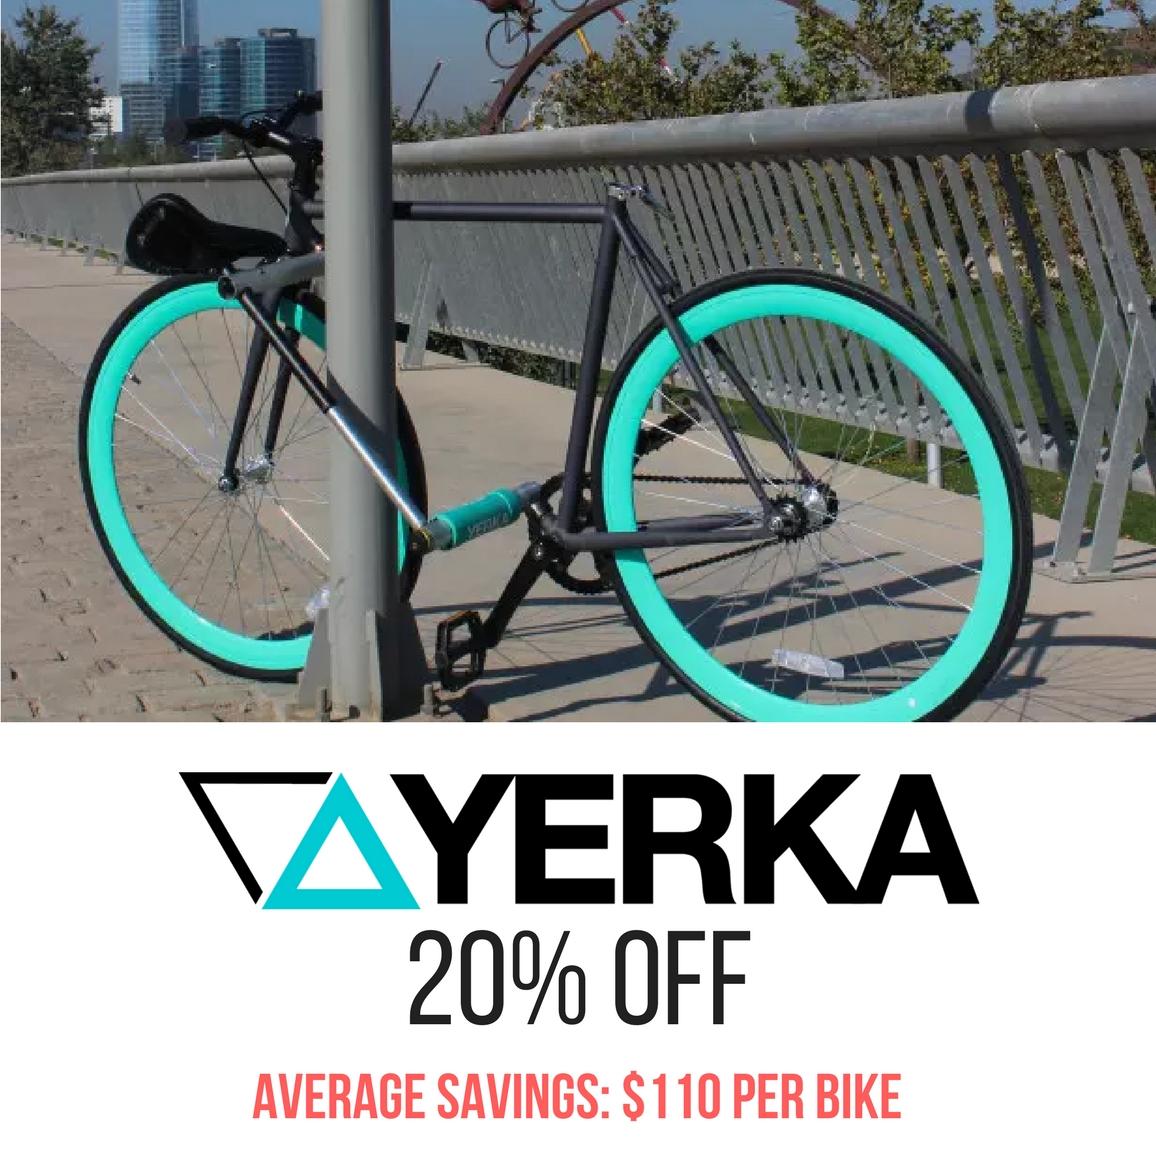 Yerka Bikes Membership Sample Product image.jpg